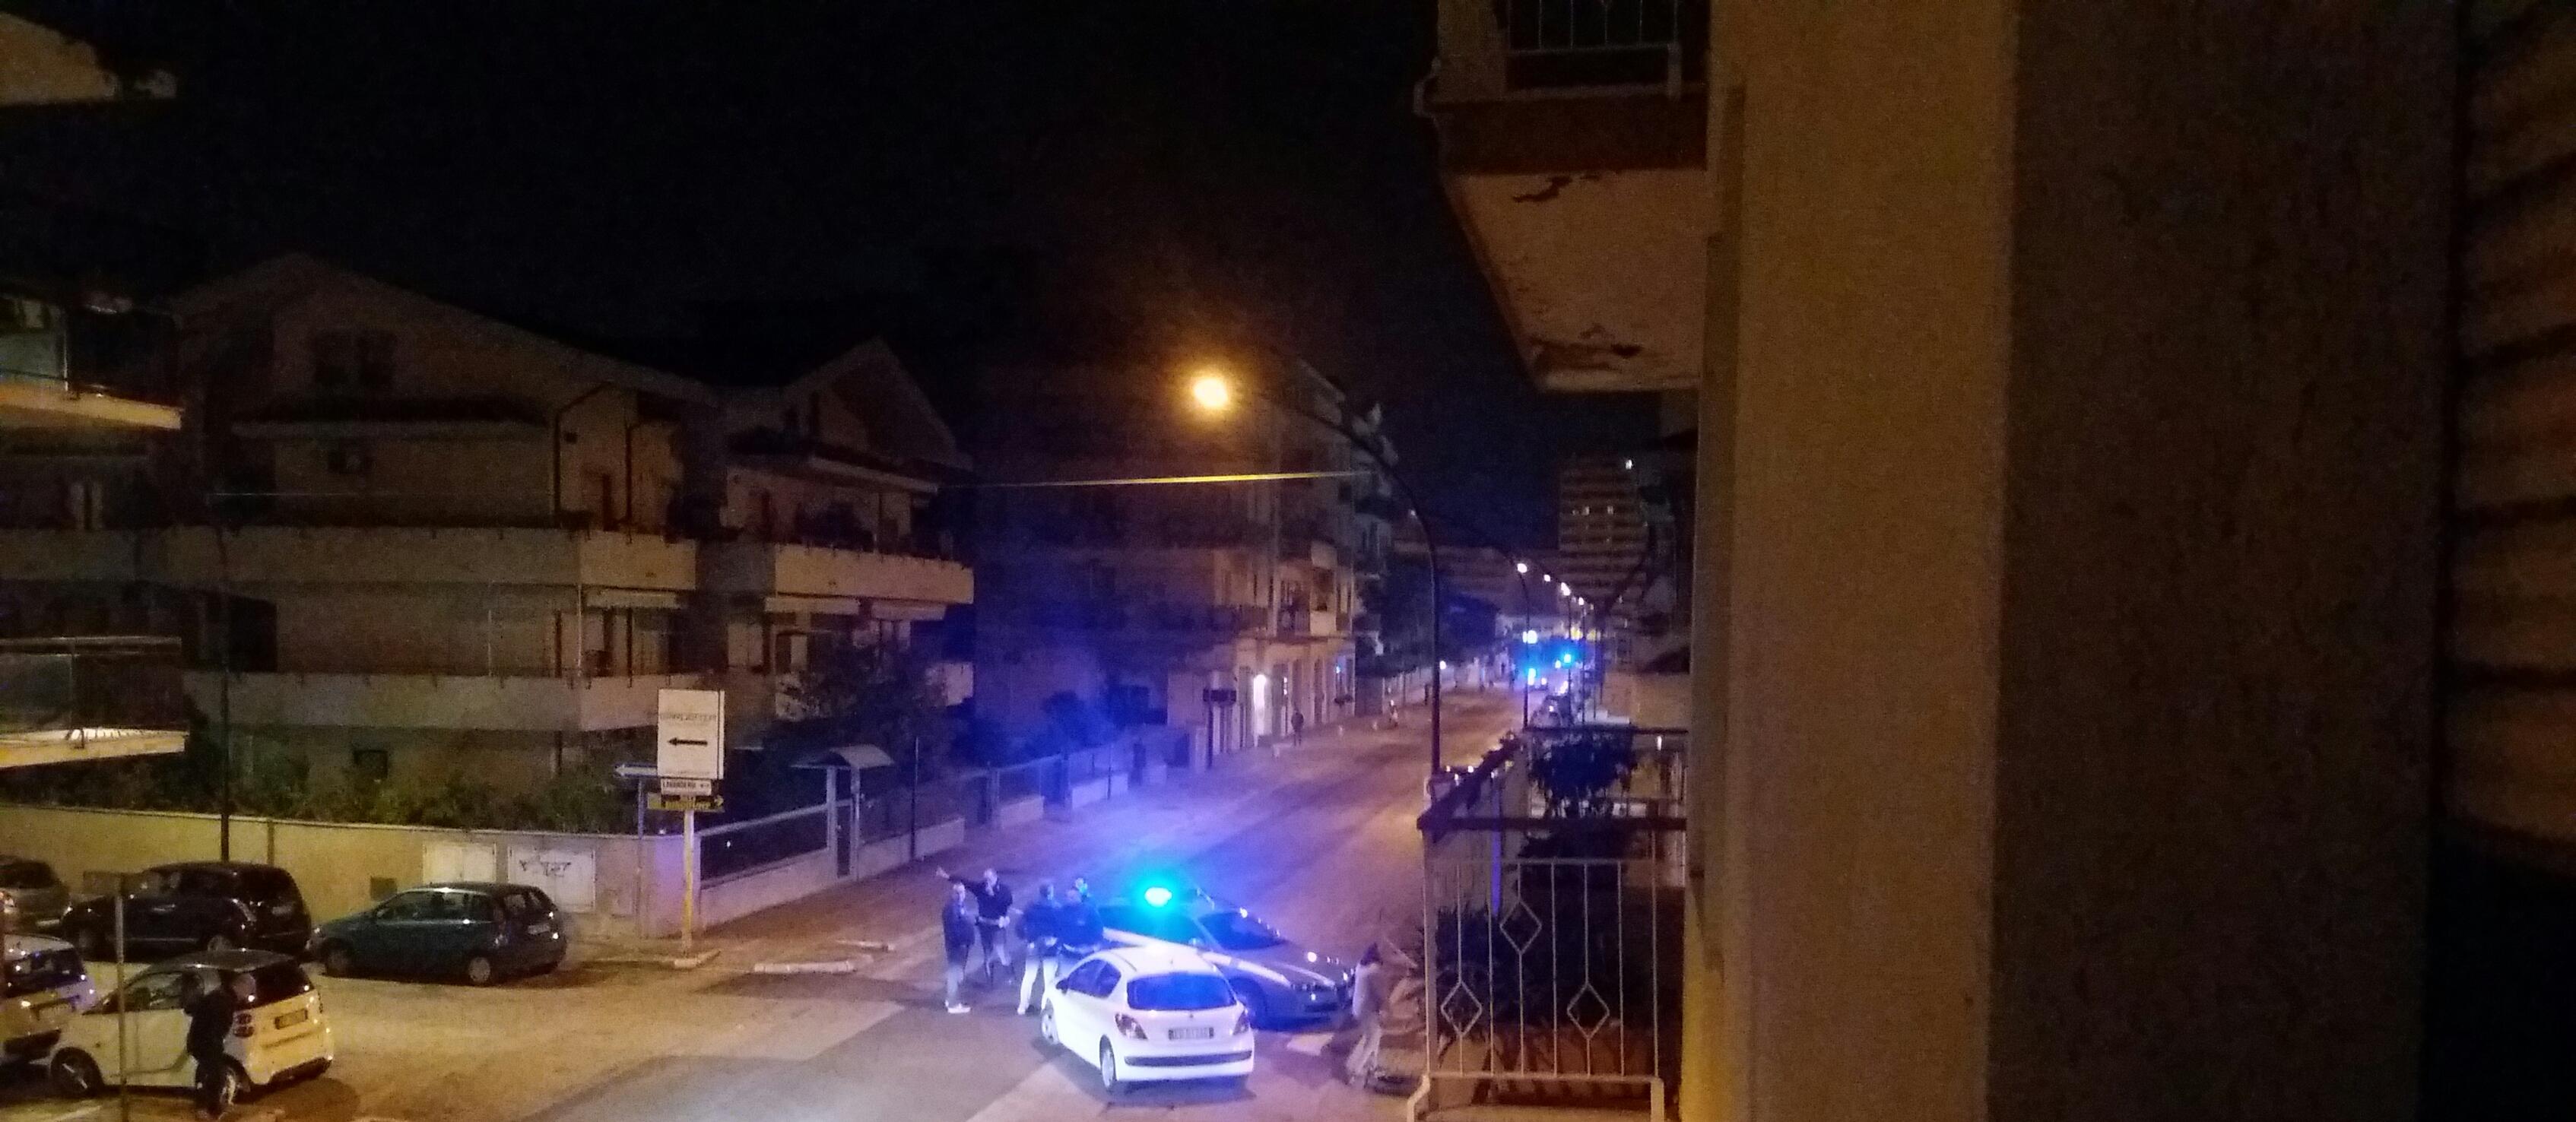 Falso ordigno in Via Bardet a Pescara